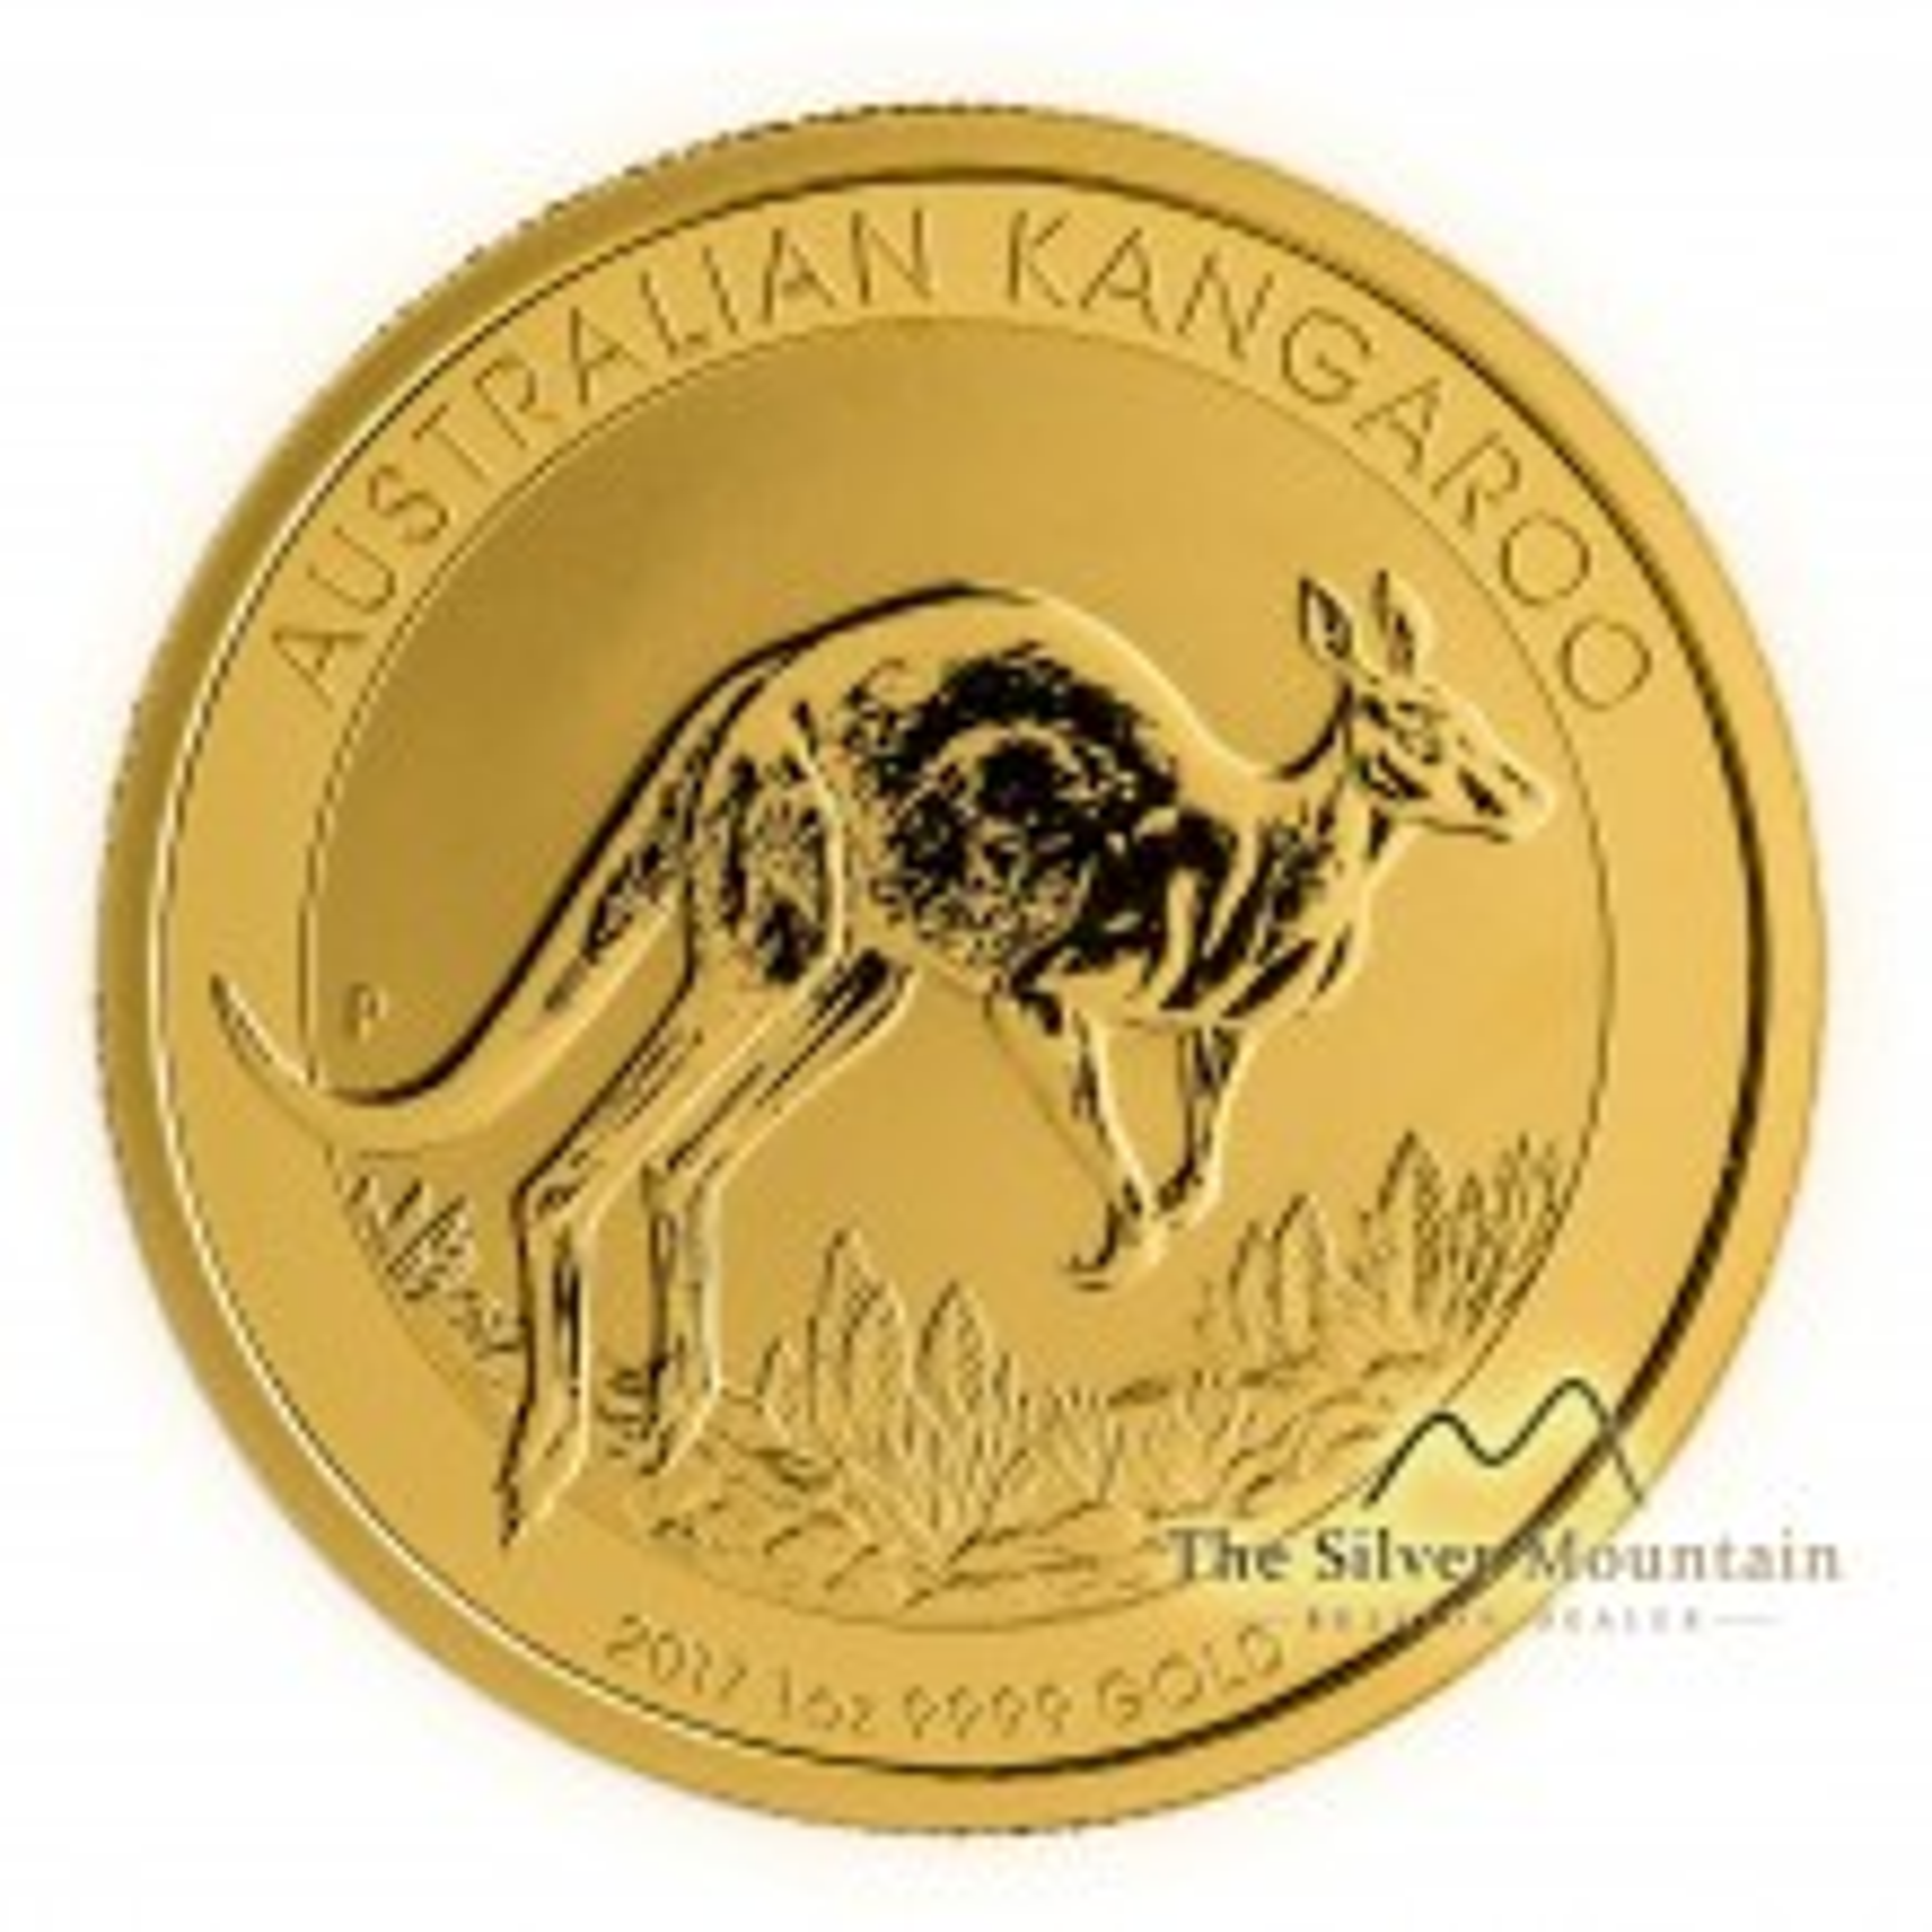 1 troy ounce gouden Kangaroo munt